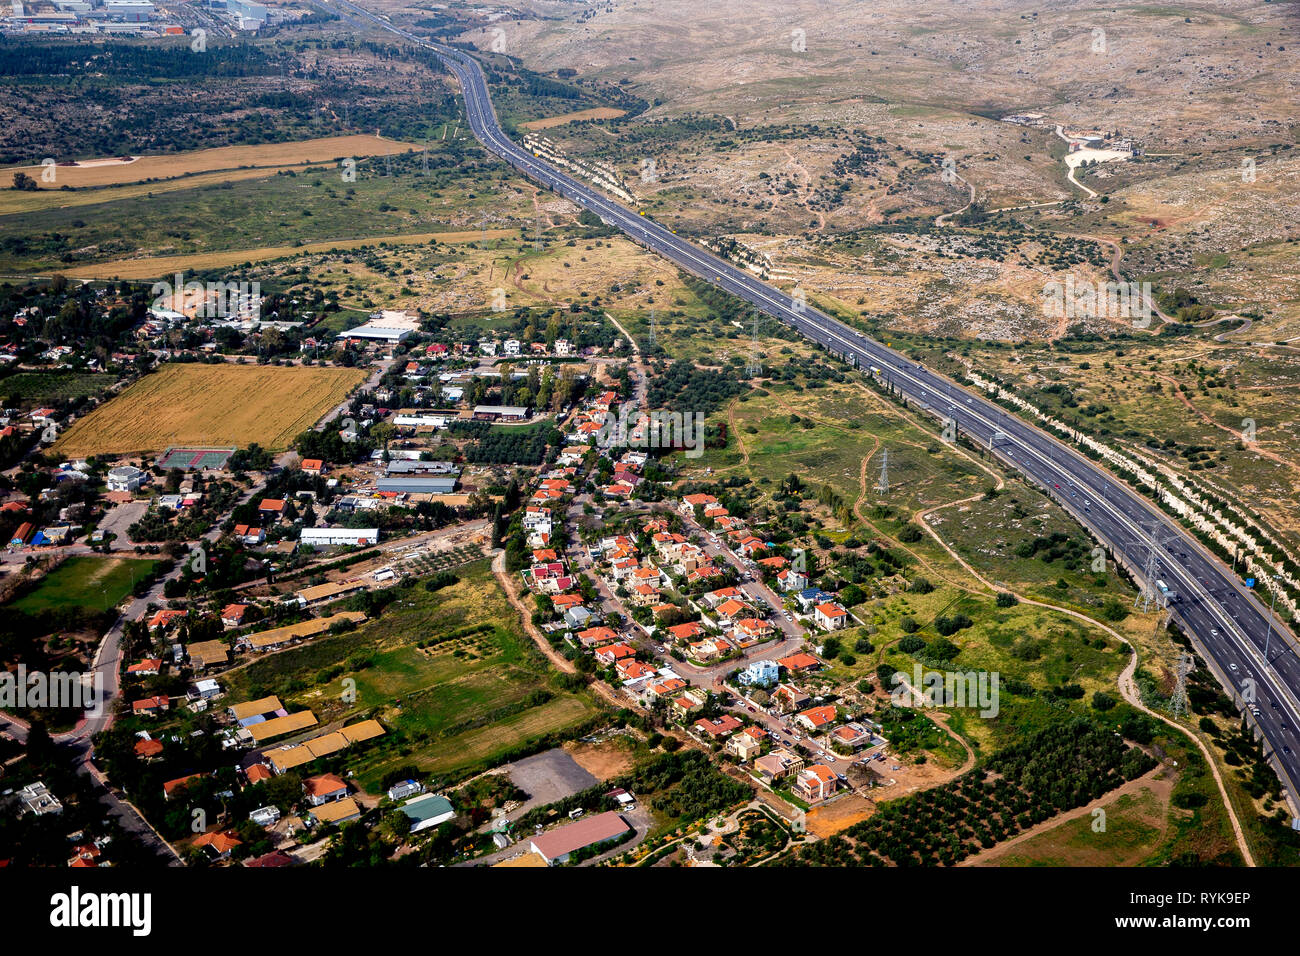 Aerial view of the coastal area near Tel Aviv, Israel. Stock Photo